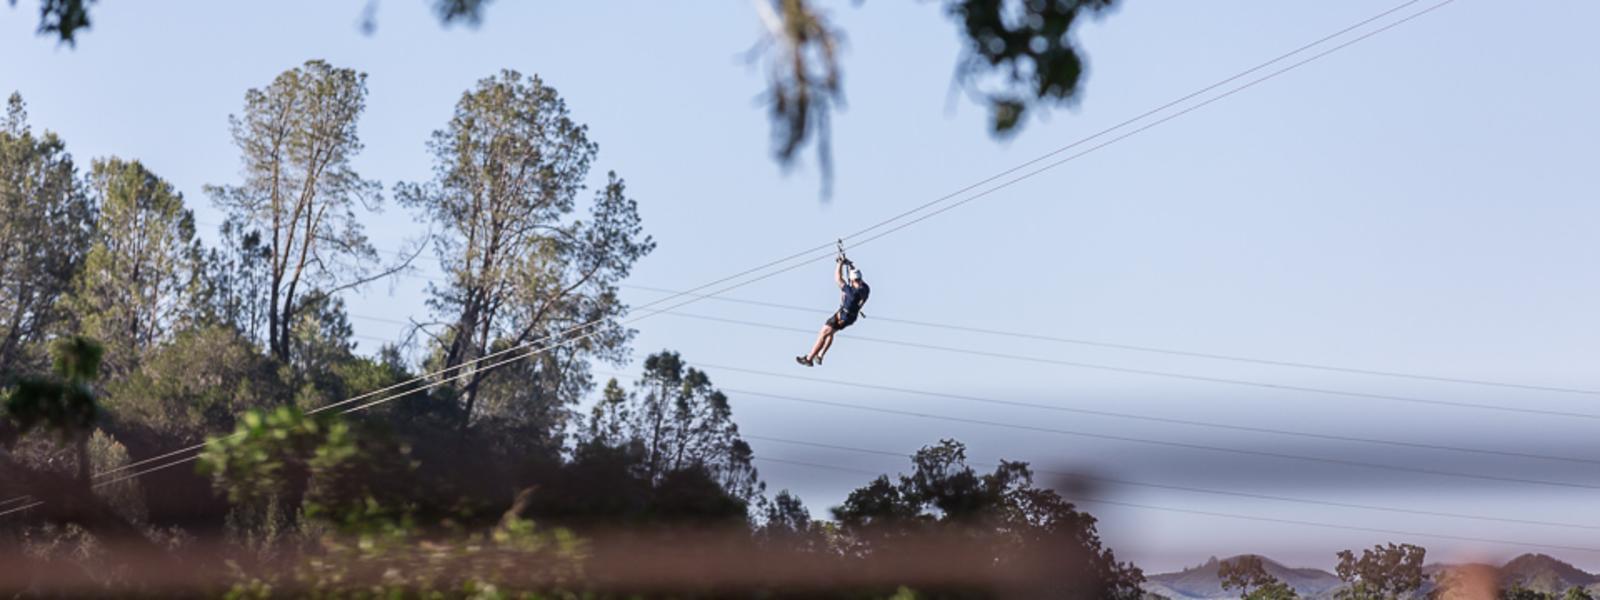 Man zip lining through the trees in San Luis Obispo